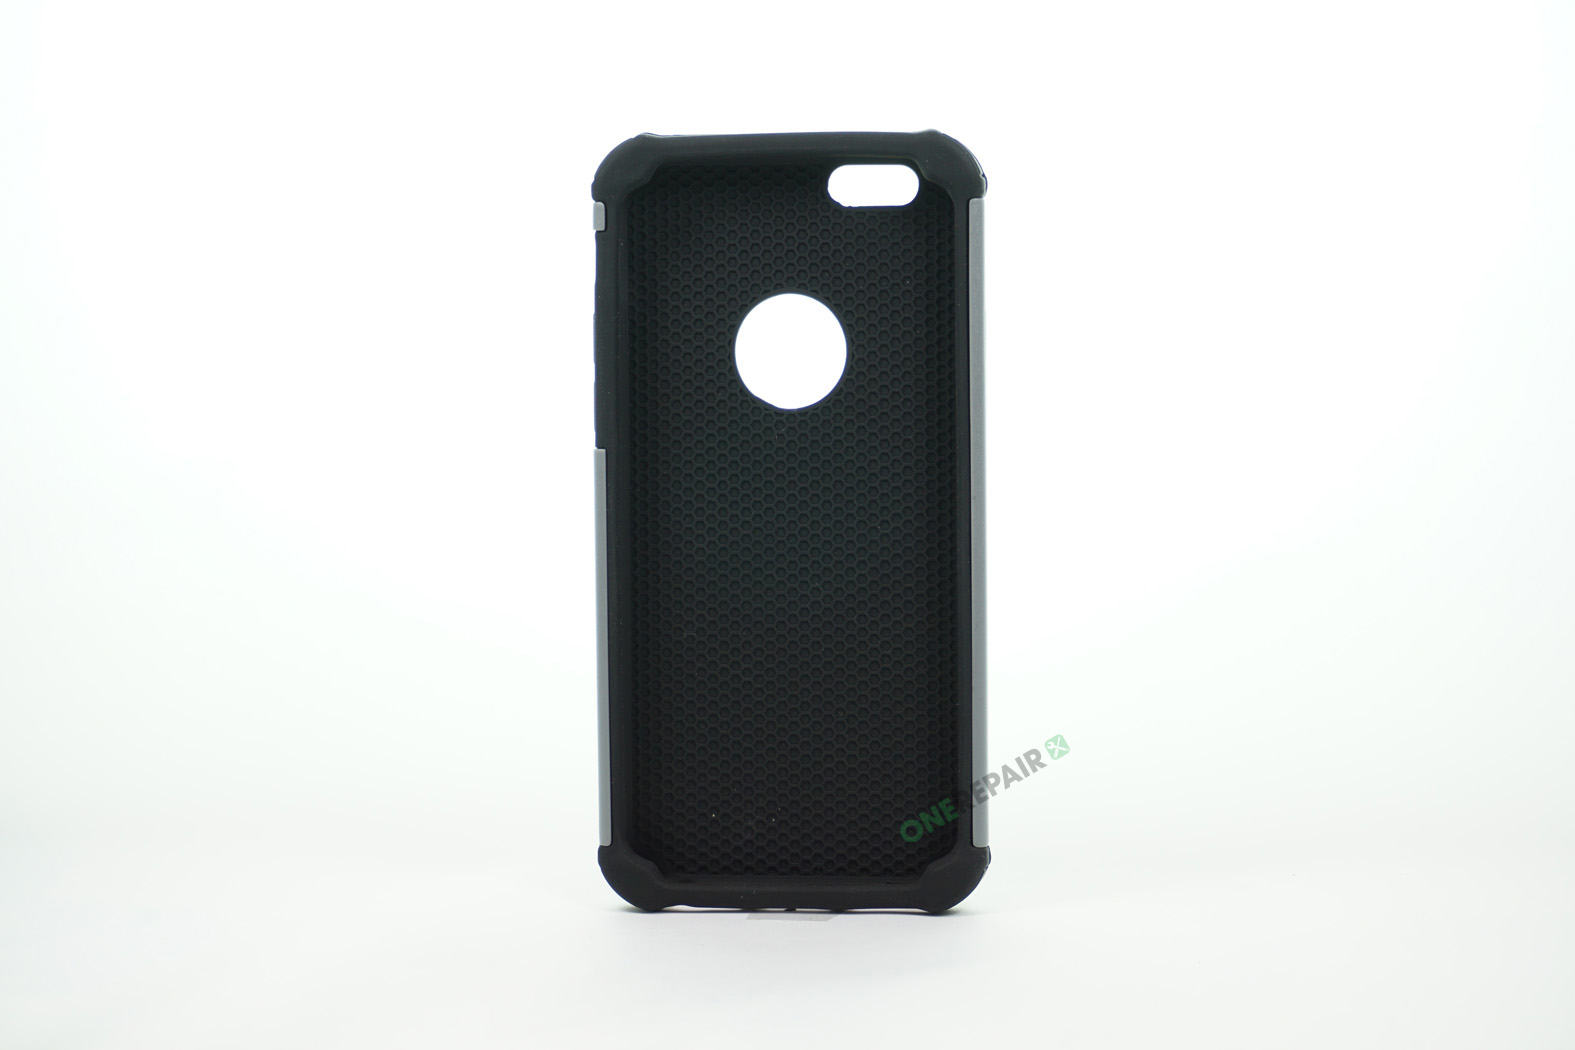 350525_iPhone_6_6S_Haandvaerkercover_Hardcase_Cover_Graa_OneRepair_00003